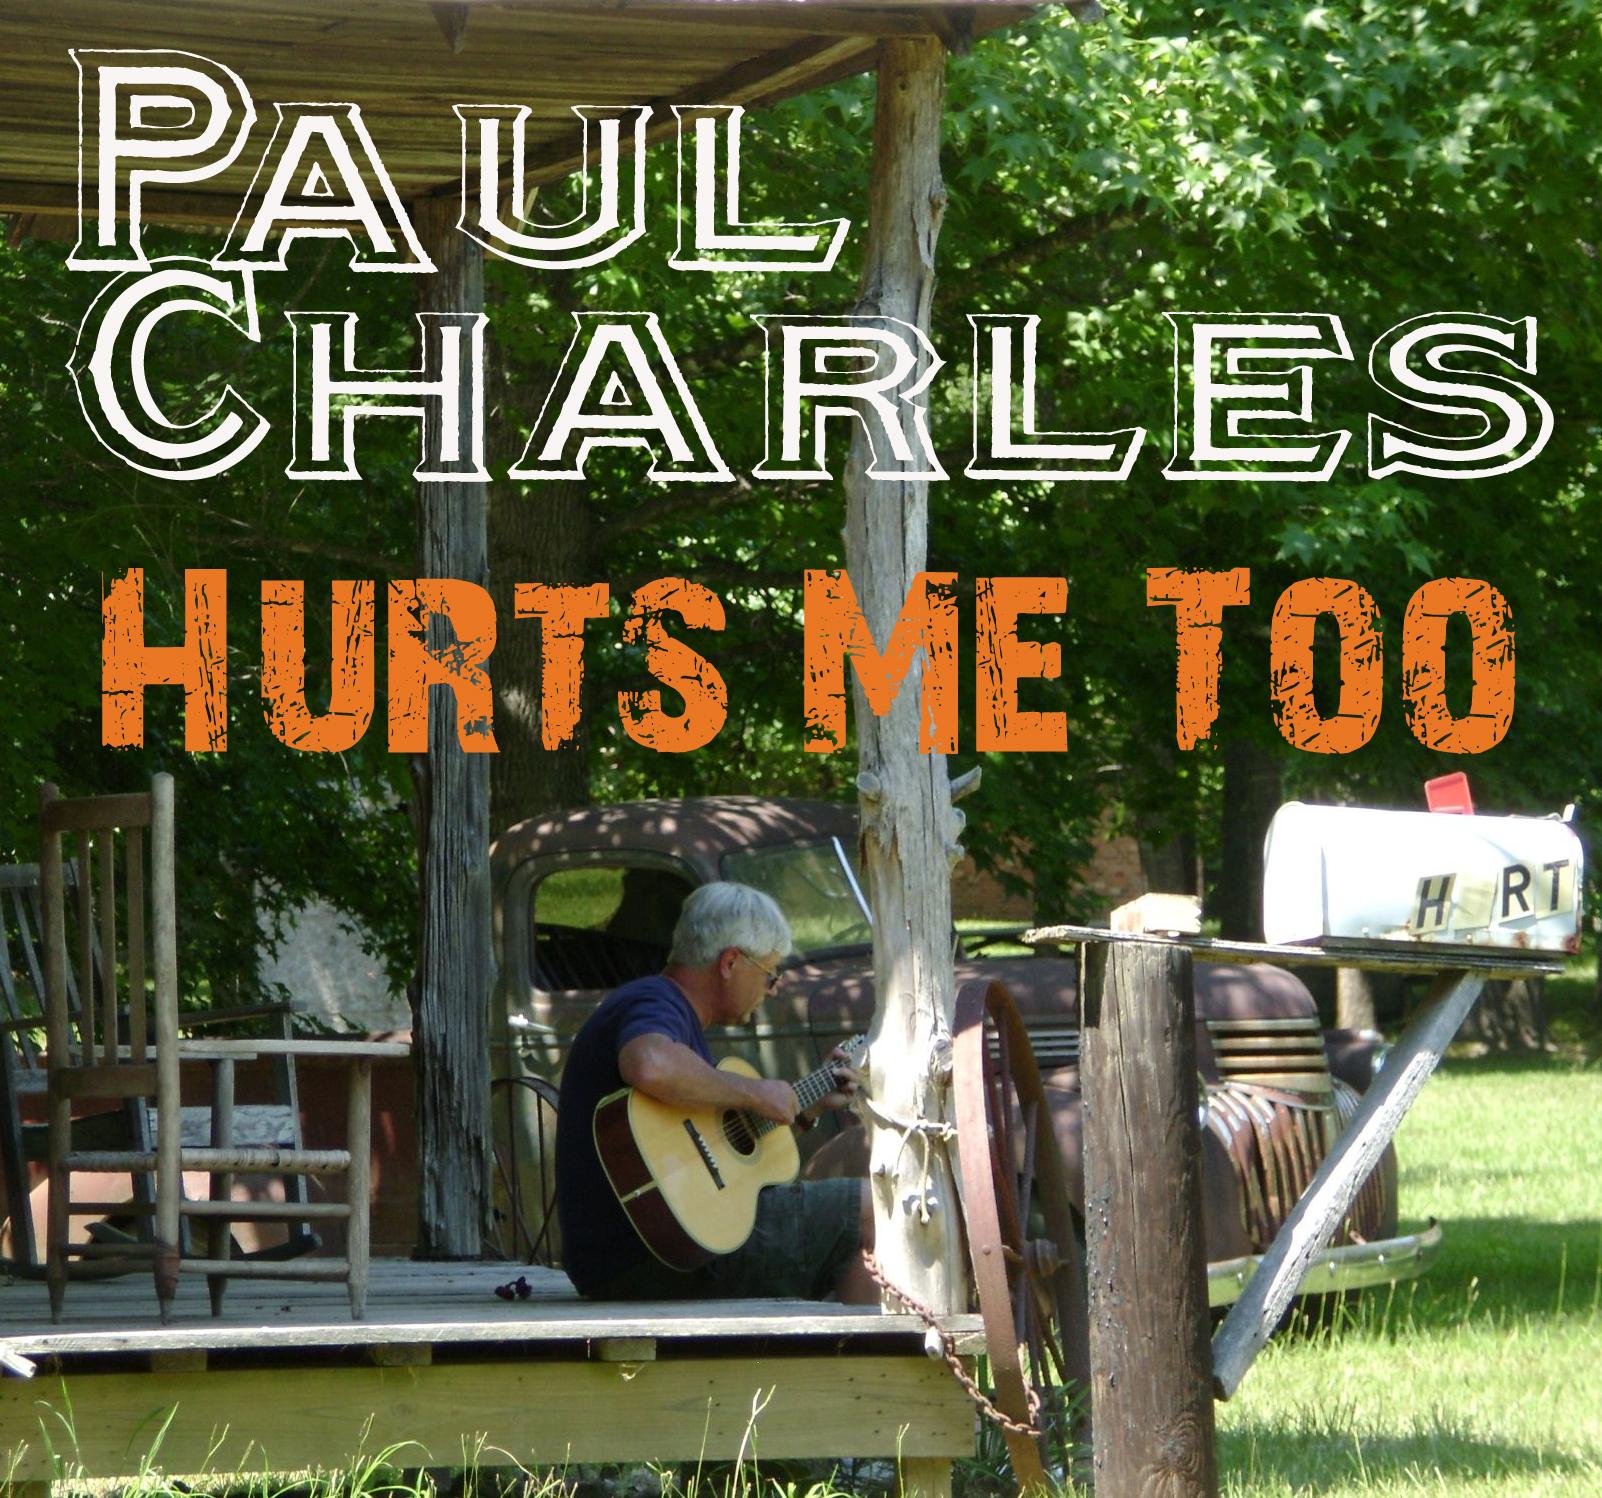 PaulCharlesSolo.com